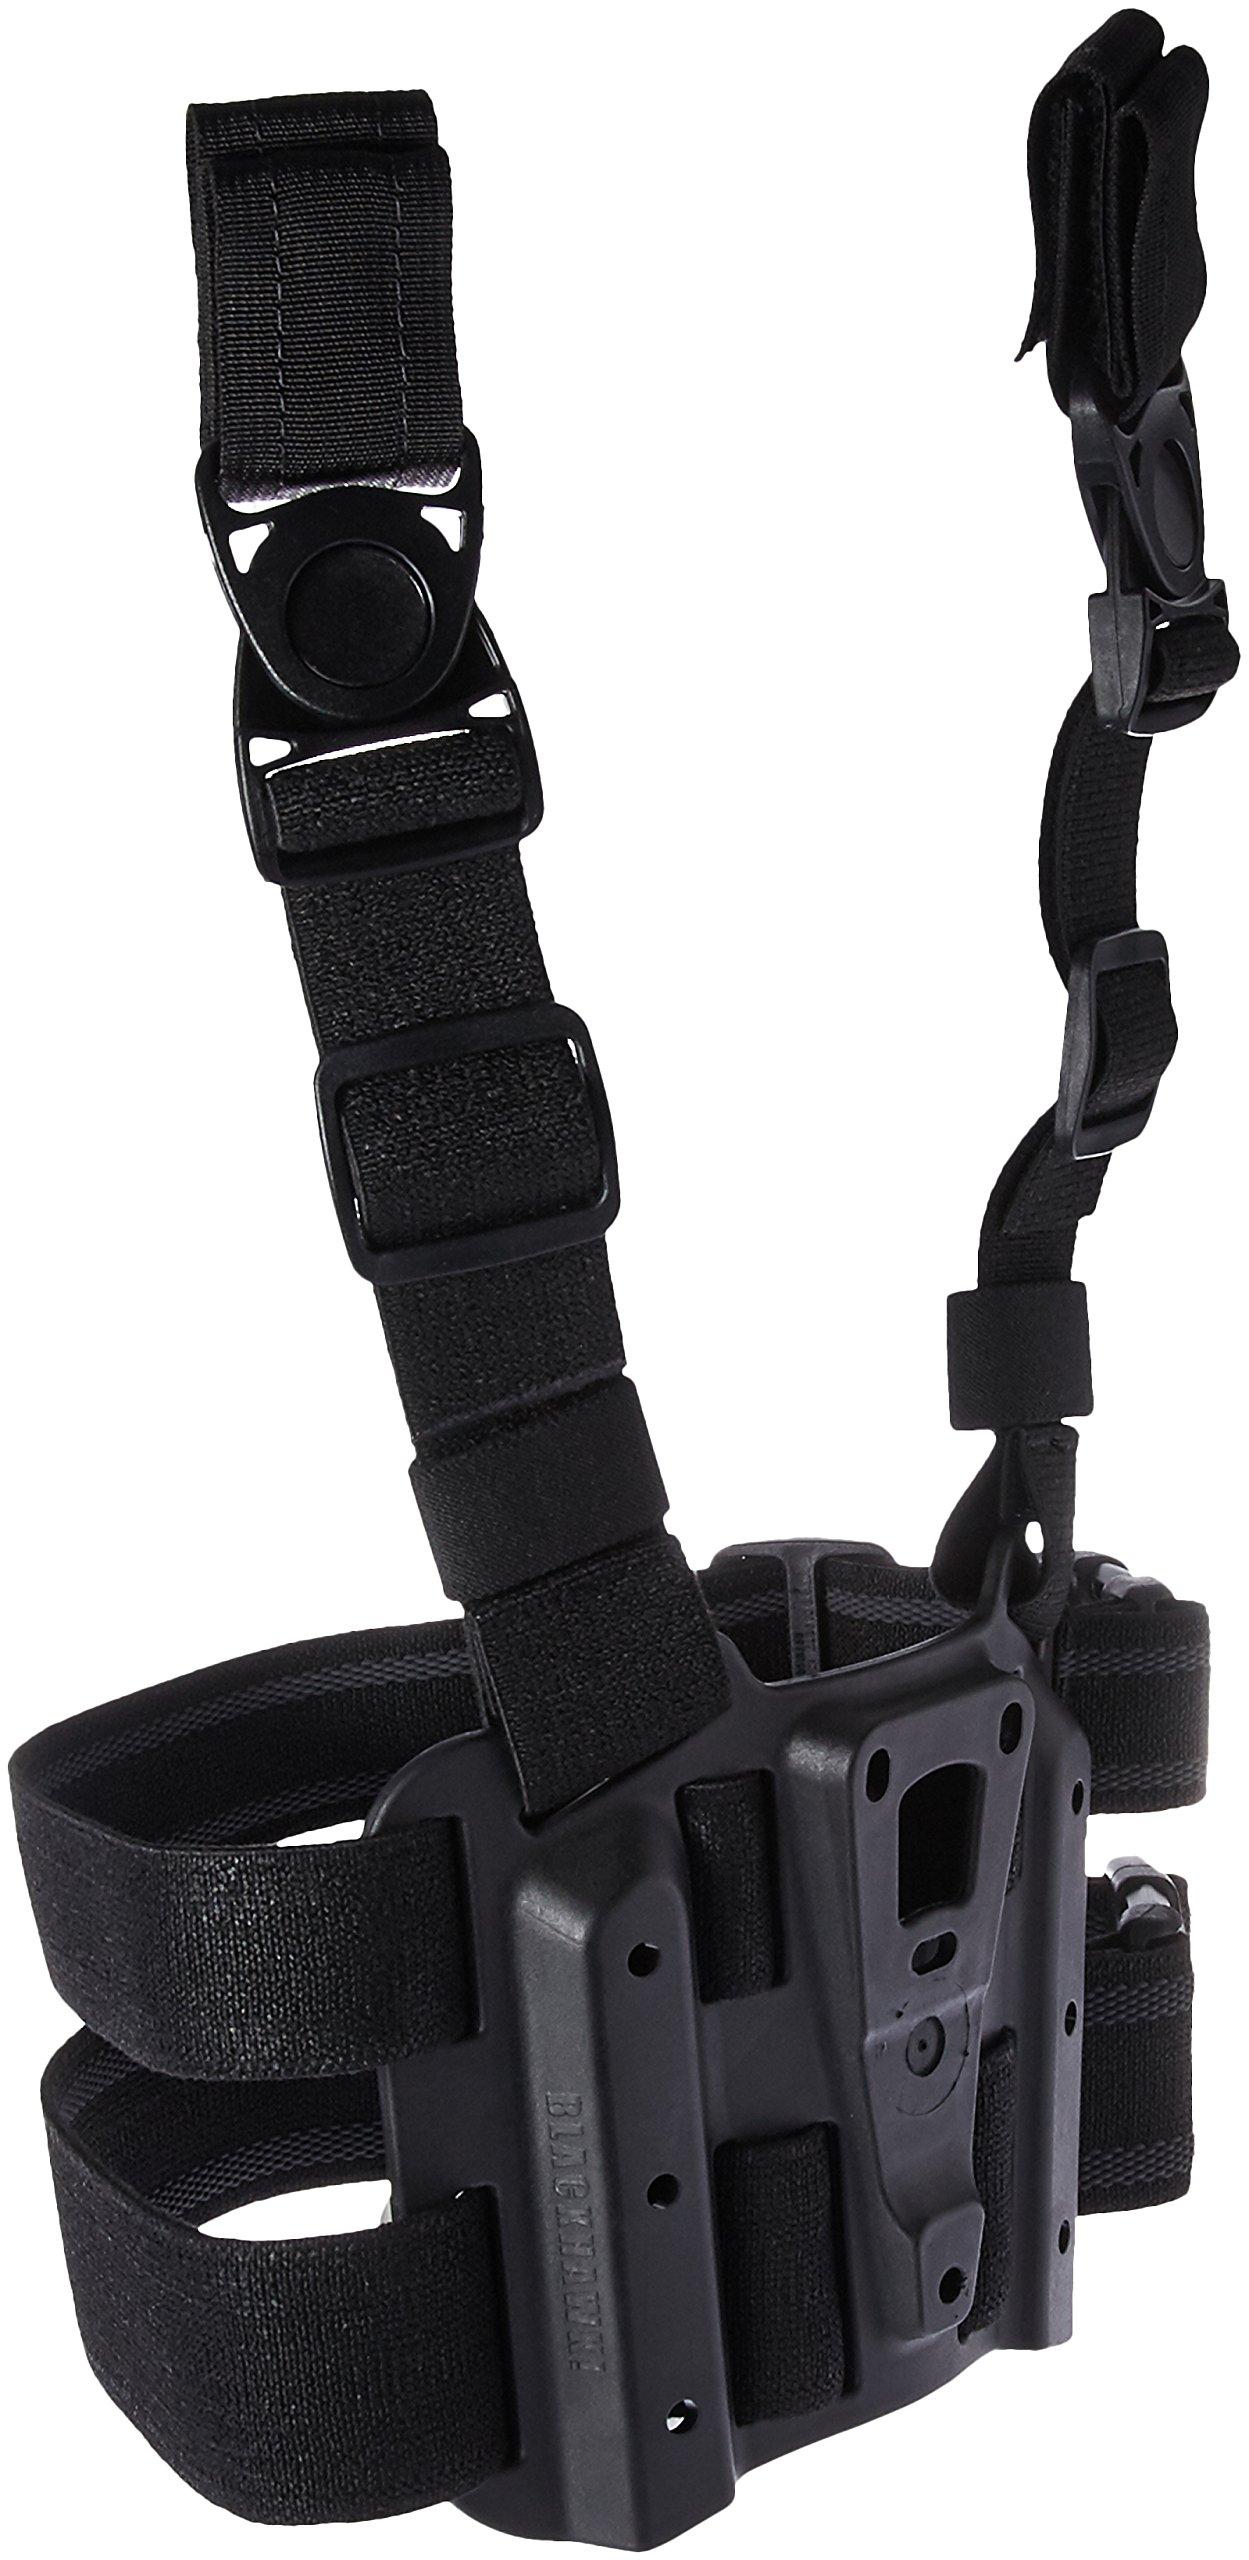 BLACKHAWK! 432000PBK Tactical Holster Platform, Black by BLACKHAWK!